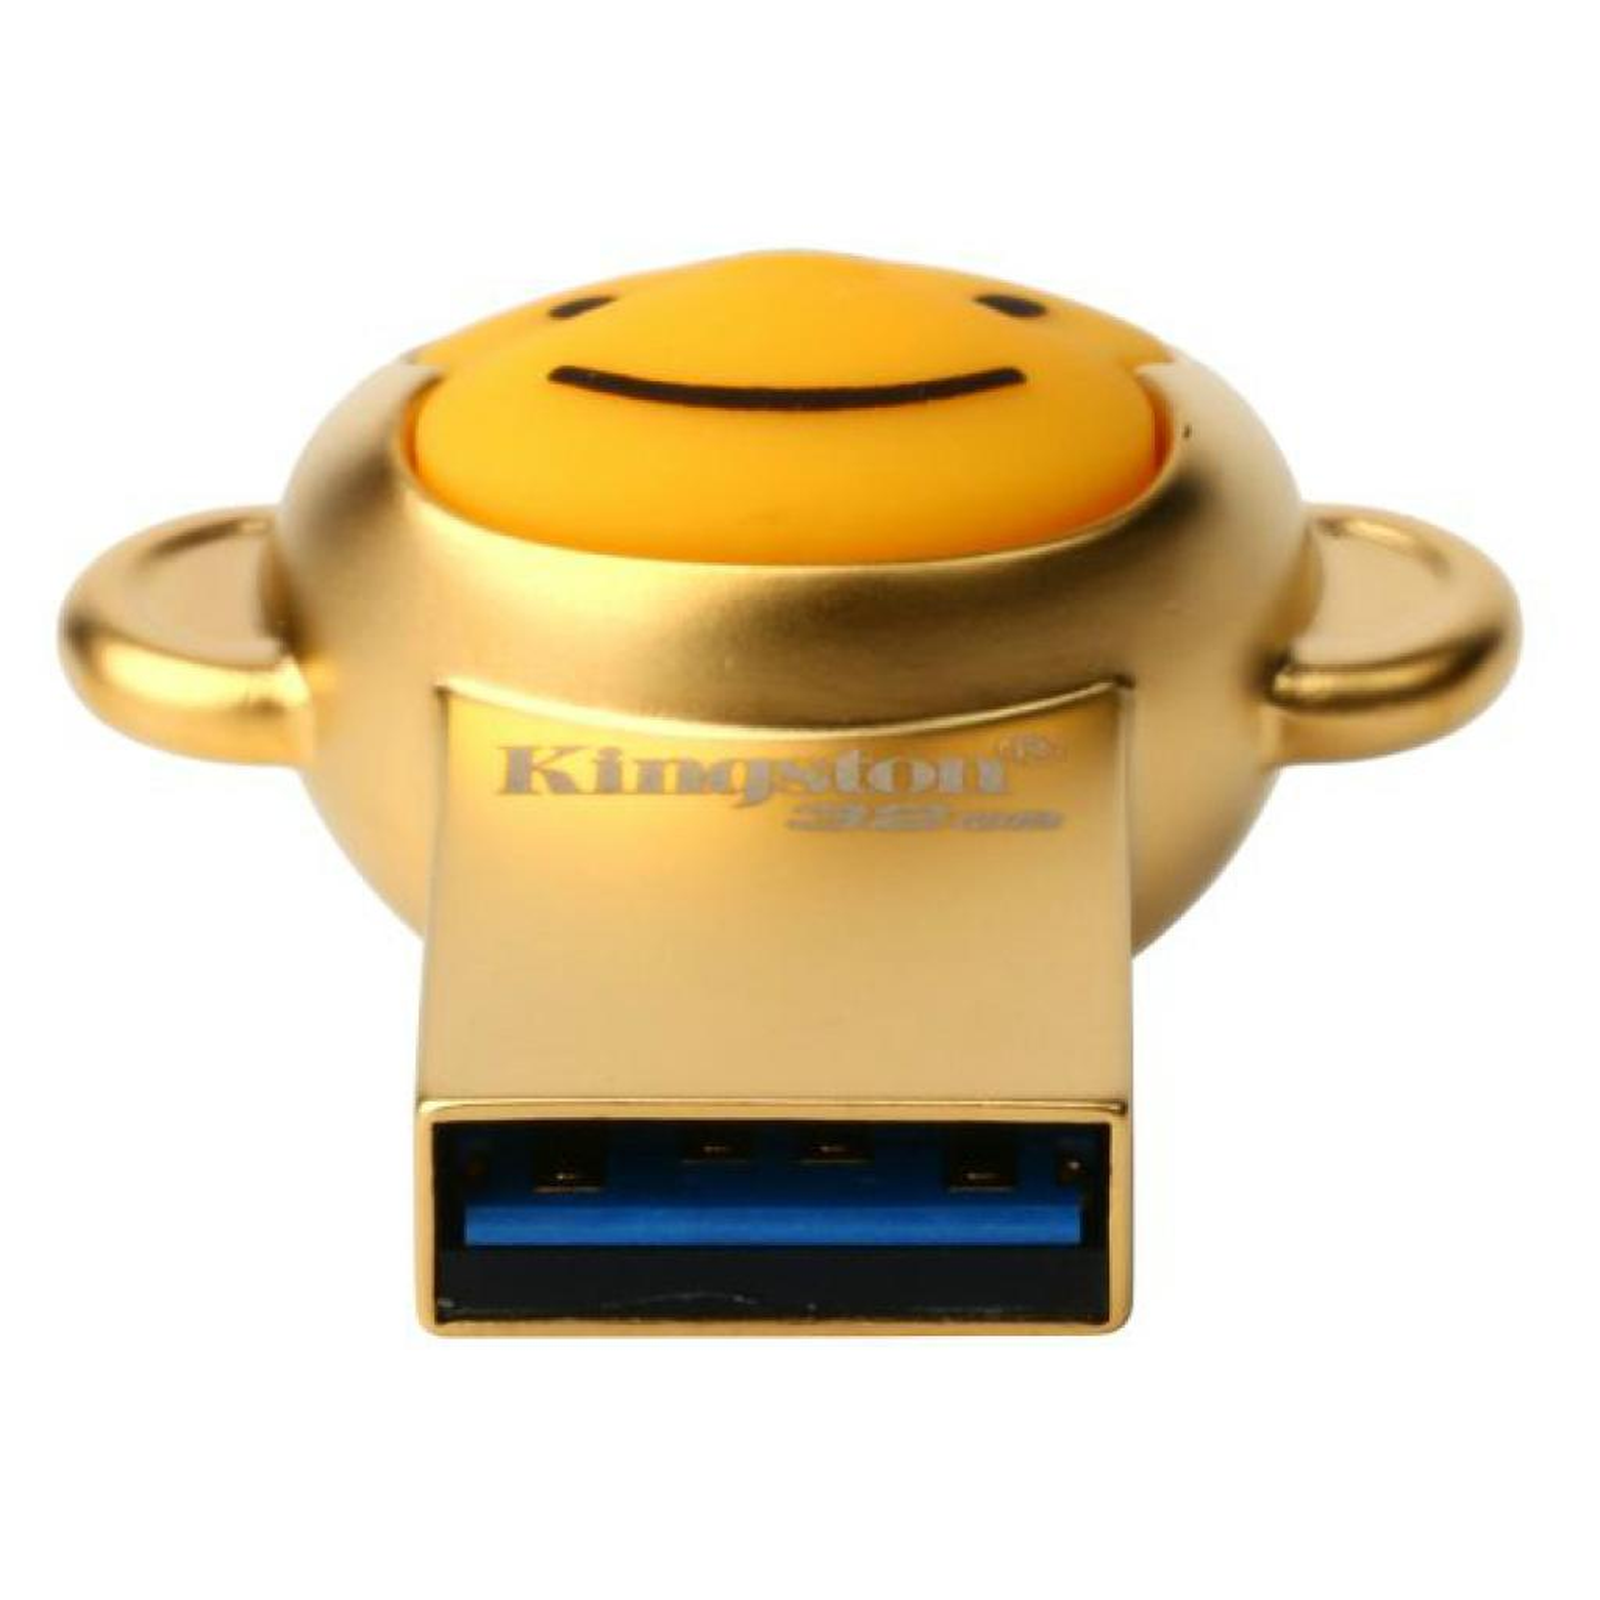 USB флеш накопитель Kingston 32GB Year of Monkey USB3.0/3.1 (DTCNY16/32GB) изображение 5